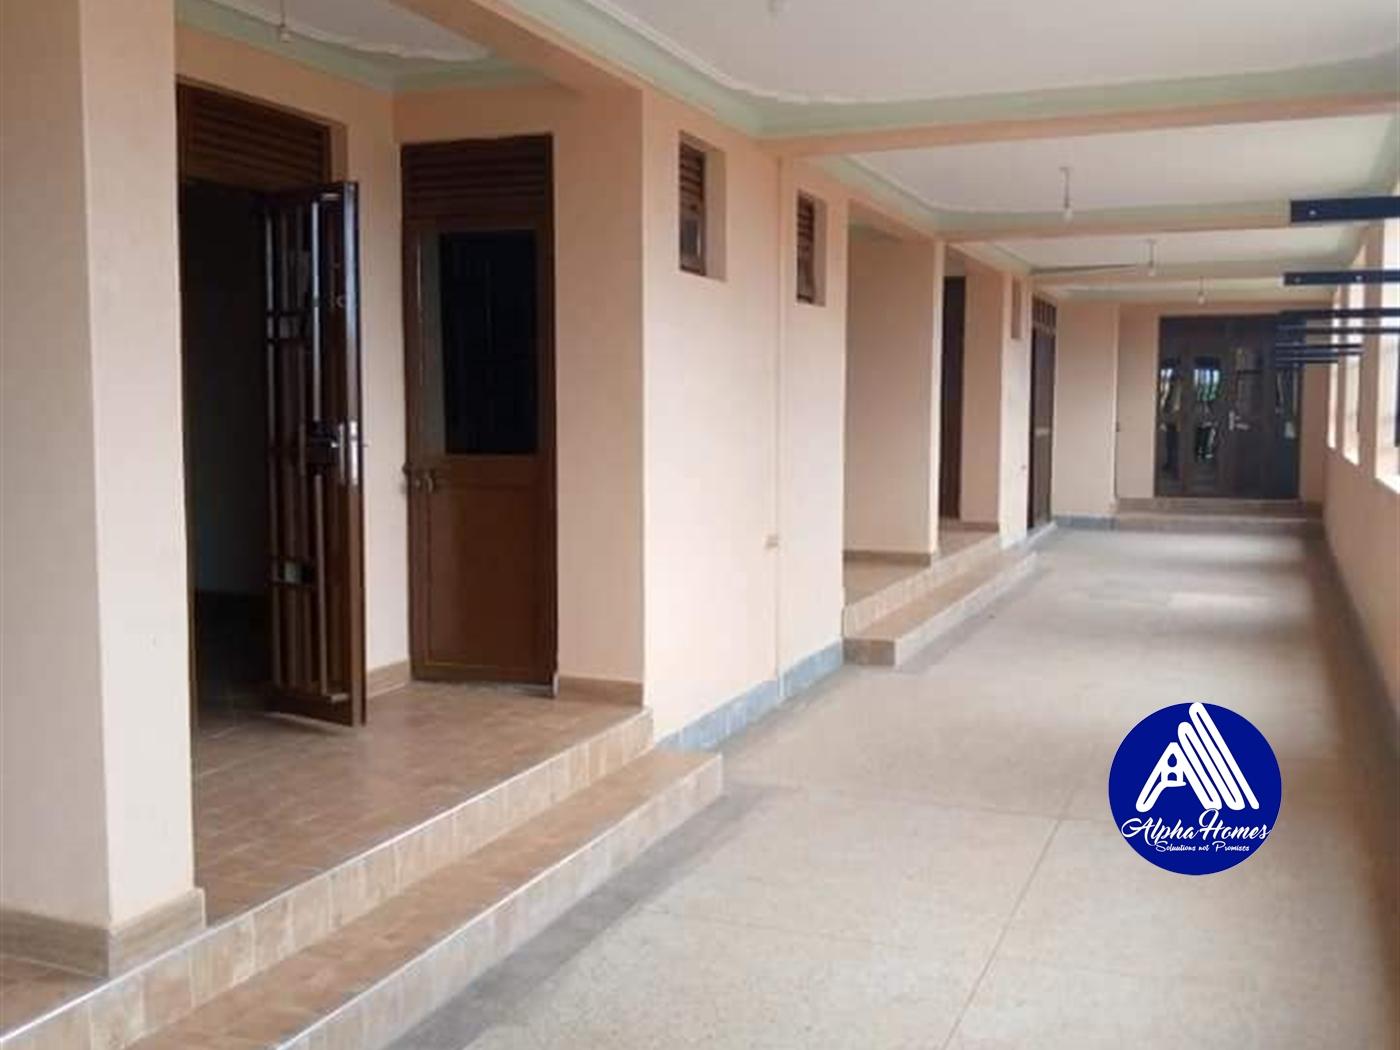 Apartment for rent in Kanyanya Kampala